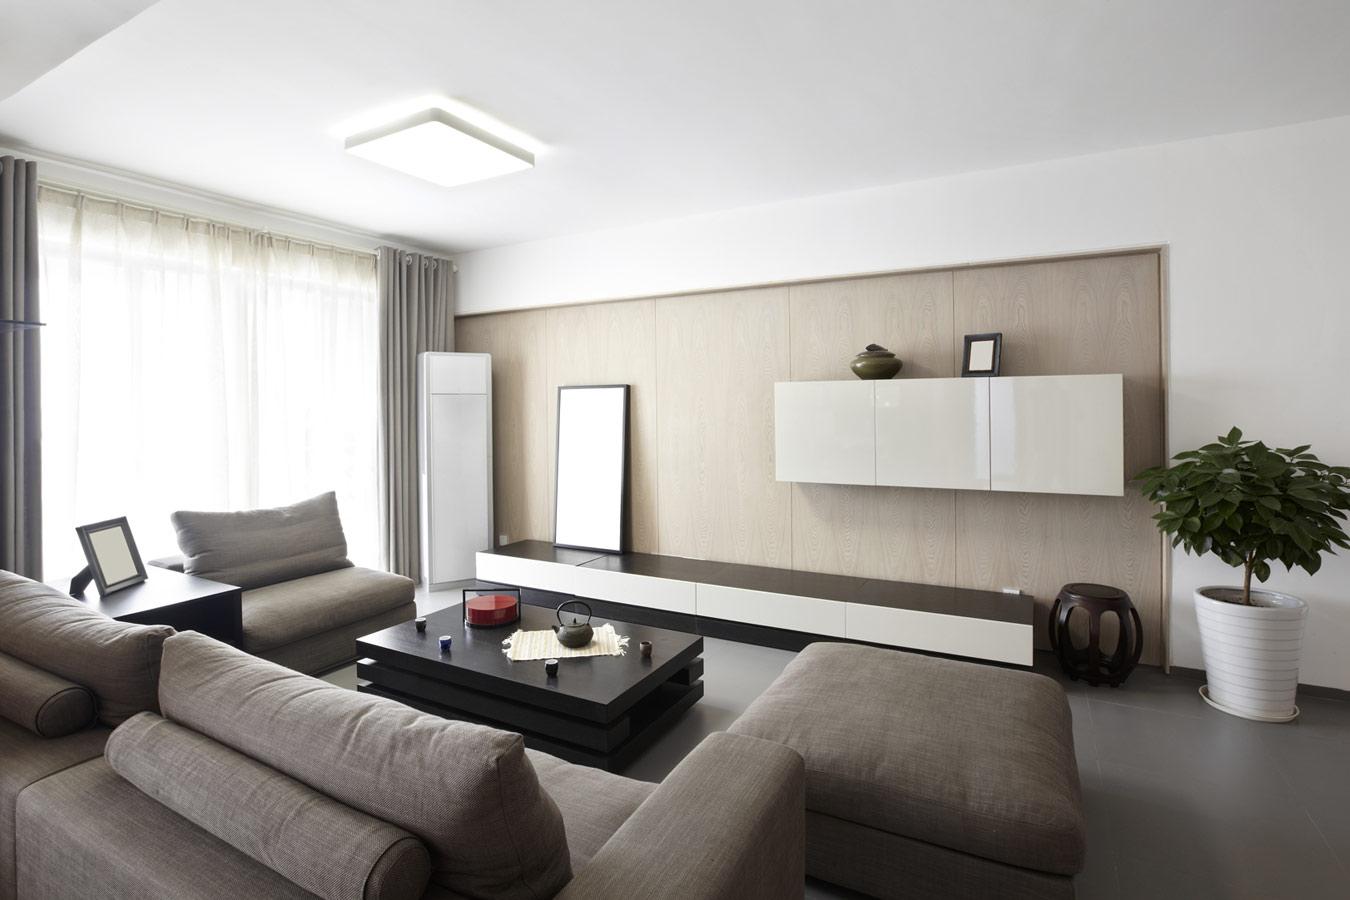 ... - Tapijt Idee Voor Woonkamers Woonkamer Inrichting Huis Interieur